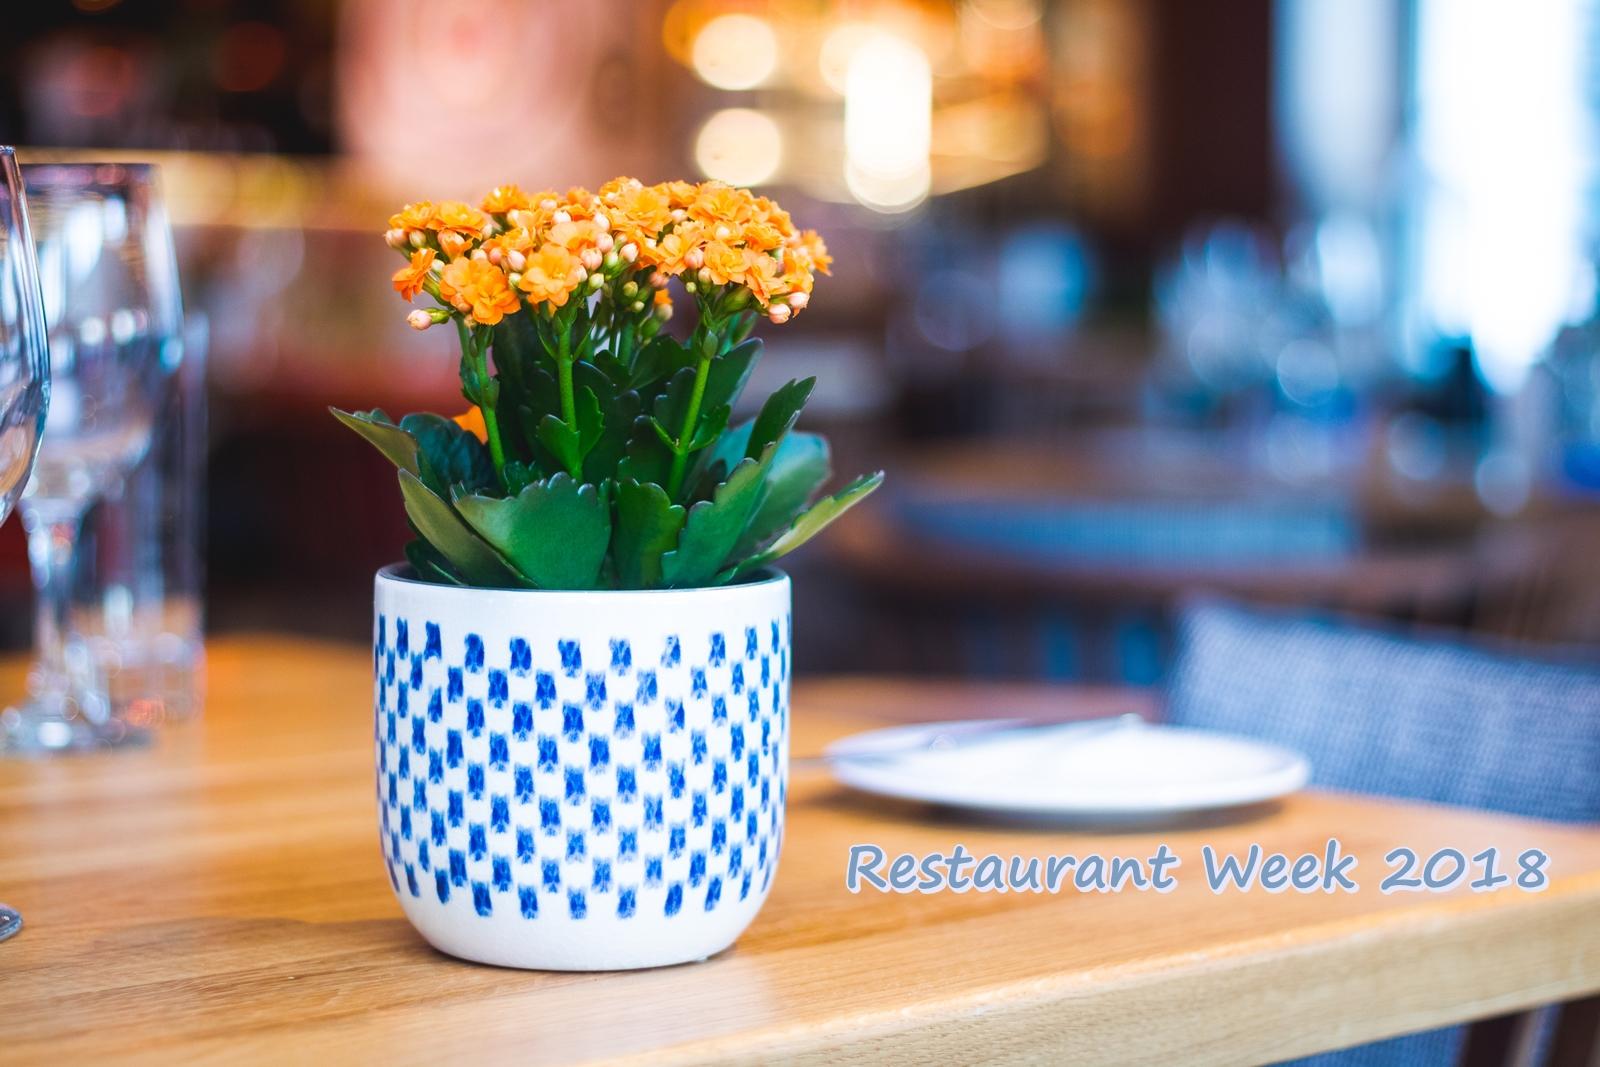 Restaurant Week Trójmiasto 2018 - VLOG